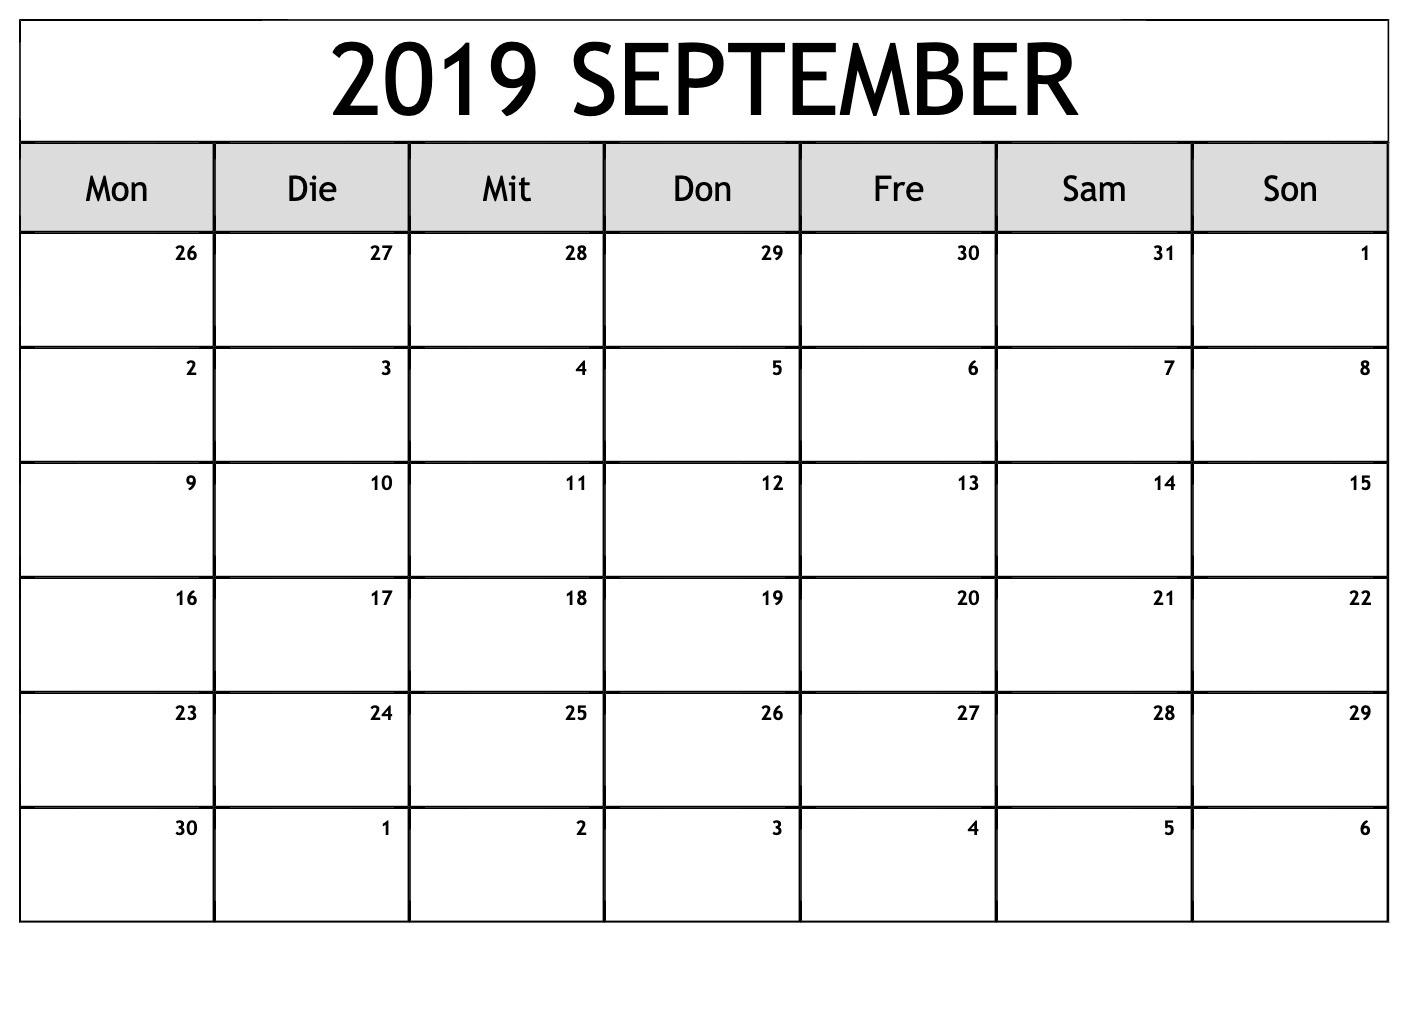 September 2019 Kalender mit Feiertagen